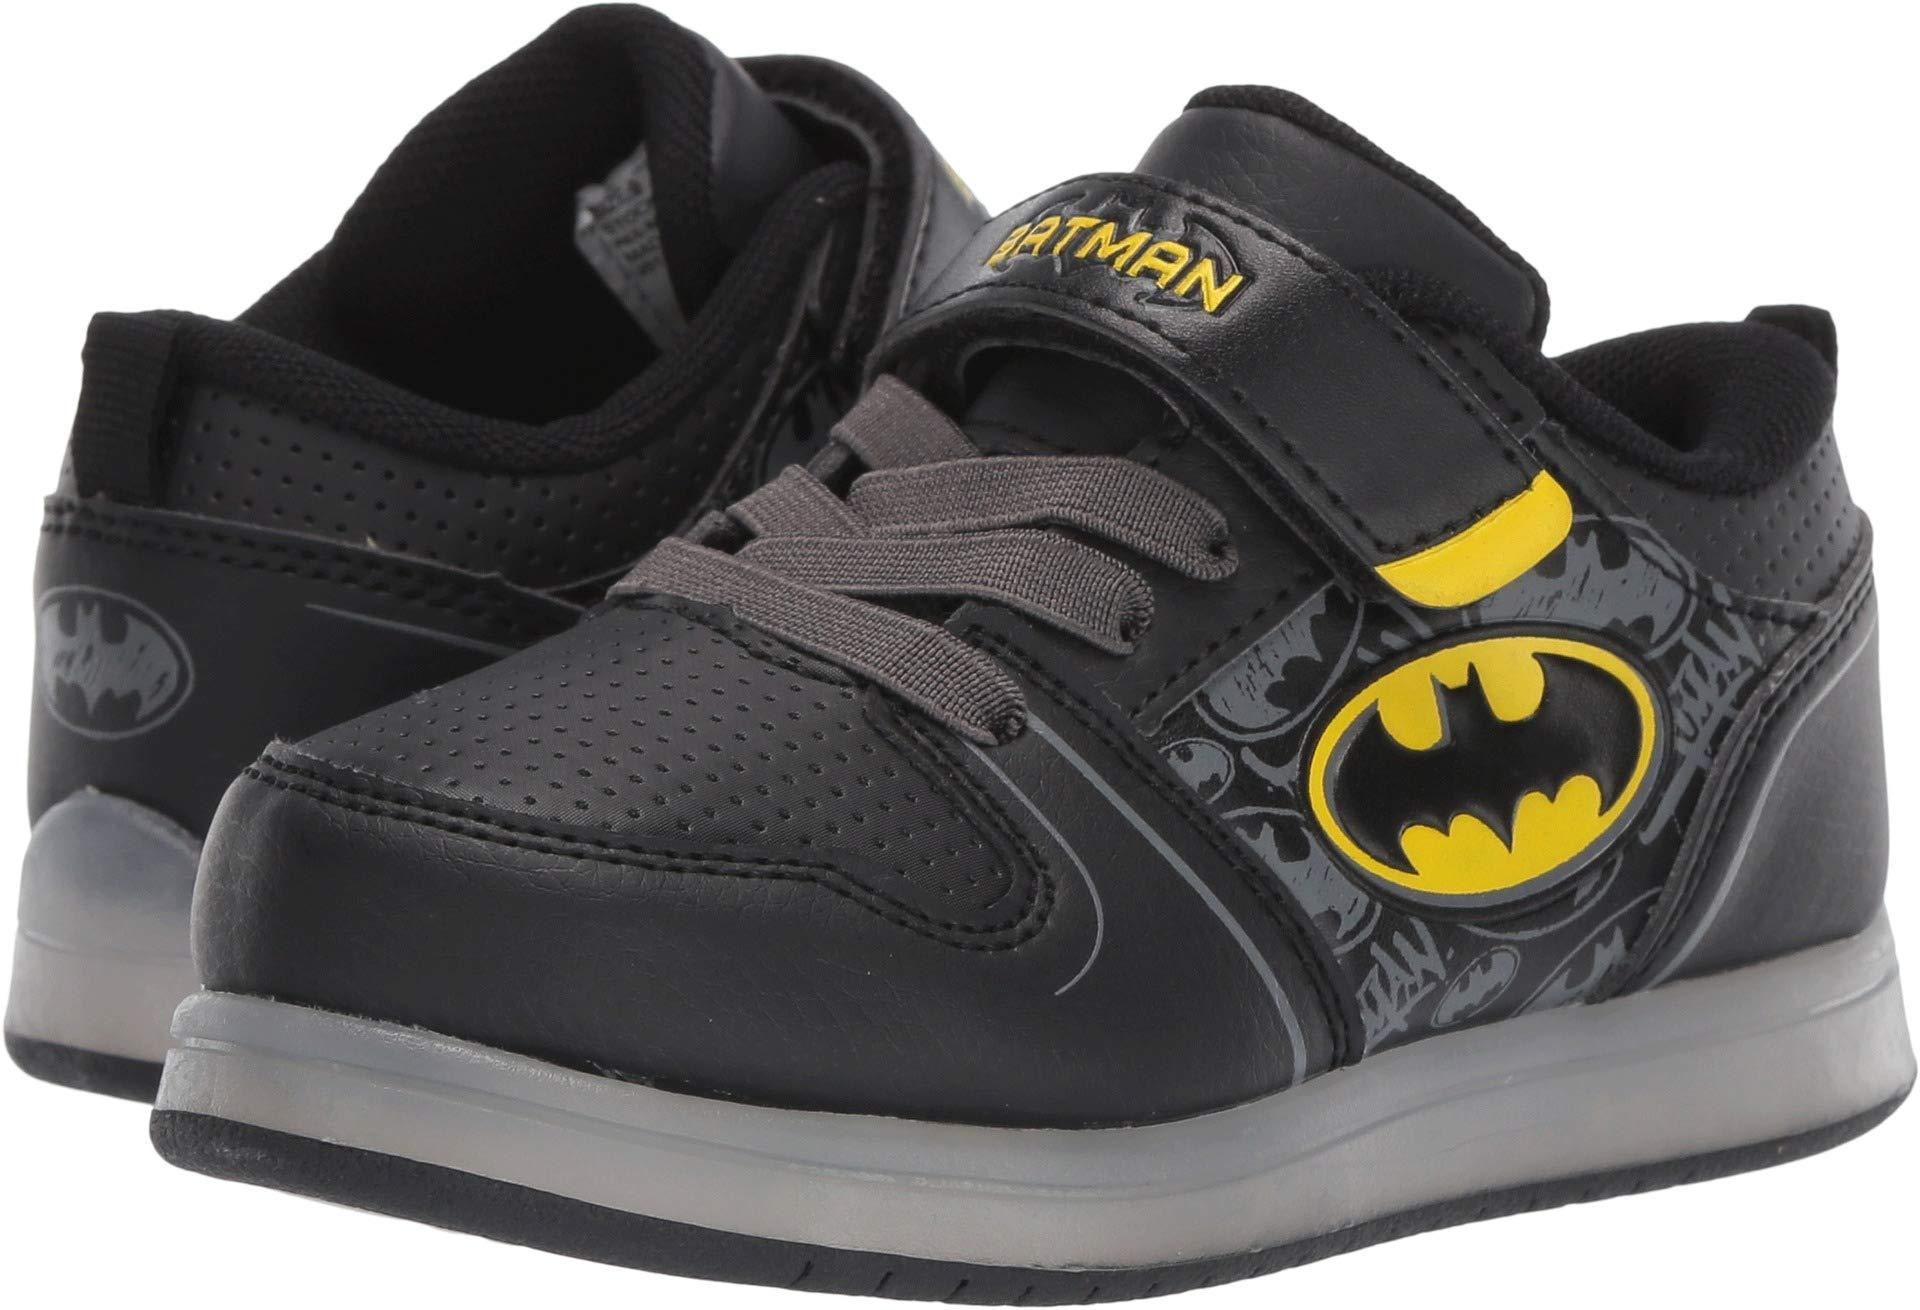 Favorite Characters Boys DC Batman Motion Lighted Sneaker (Toddler/Little Kid), Size 10 Black